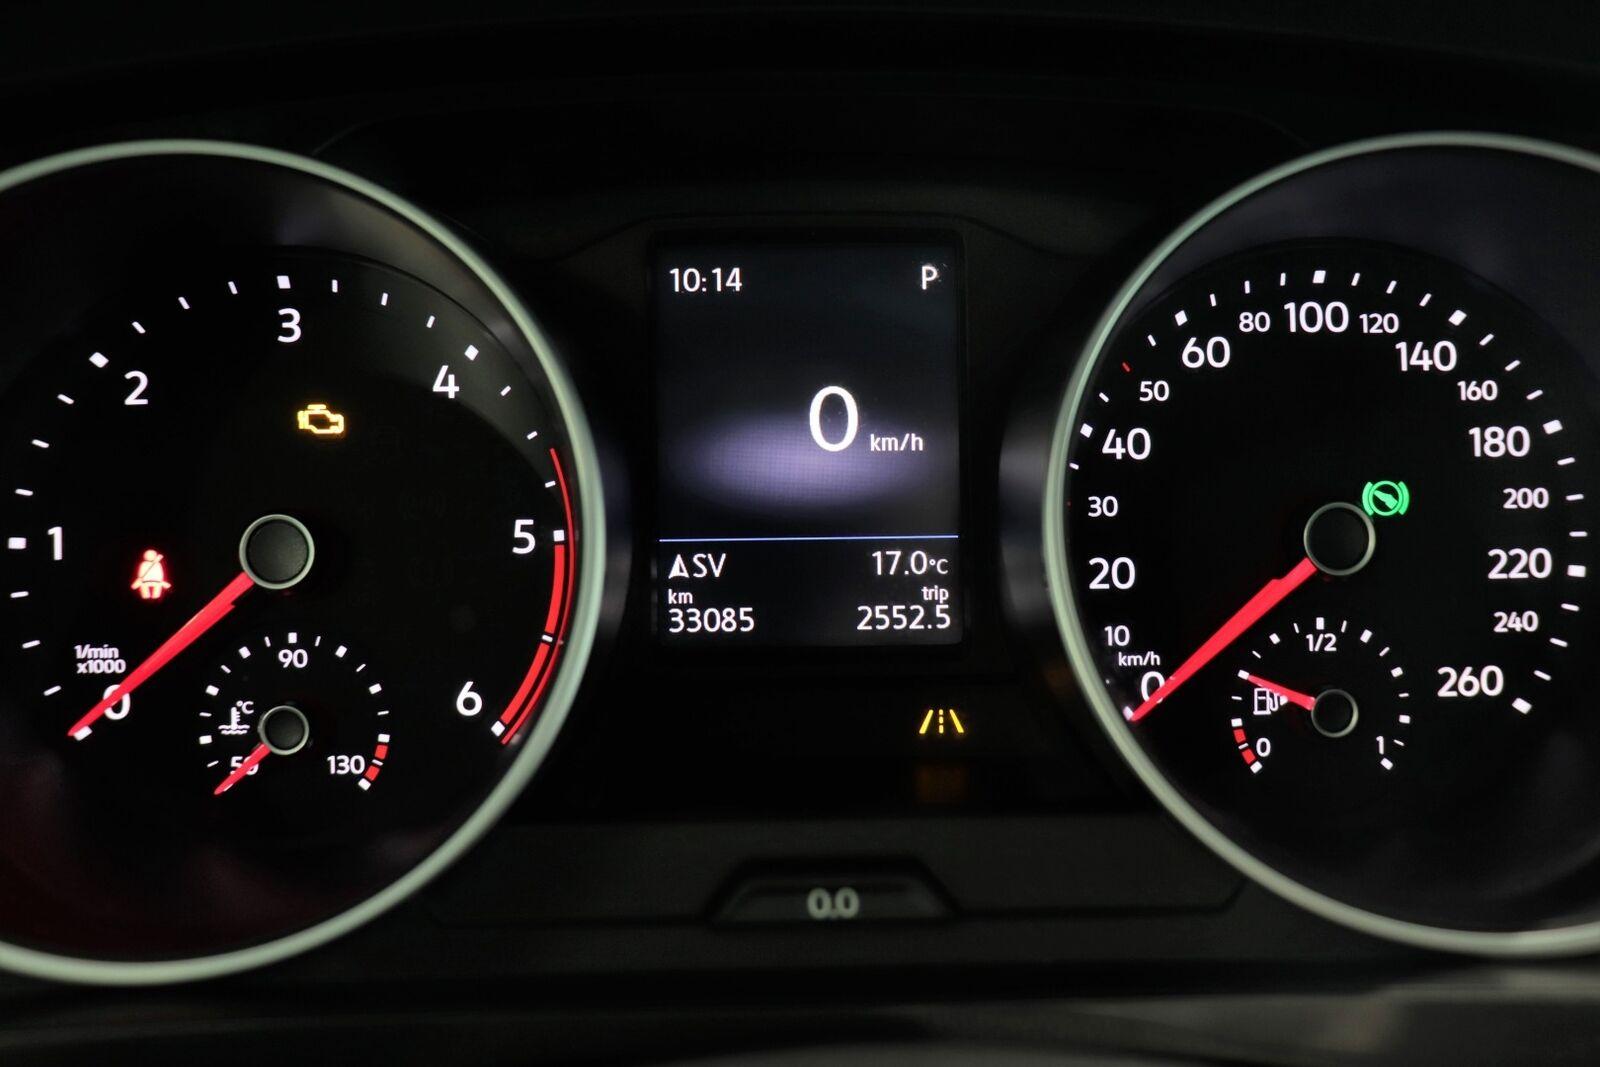 VW Tiguan TDi 150 Comfortline DSG